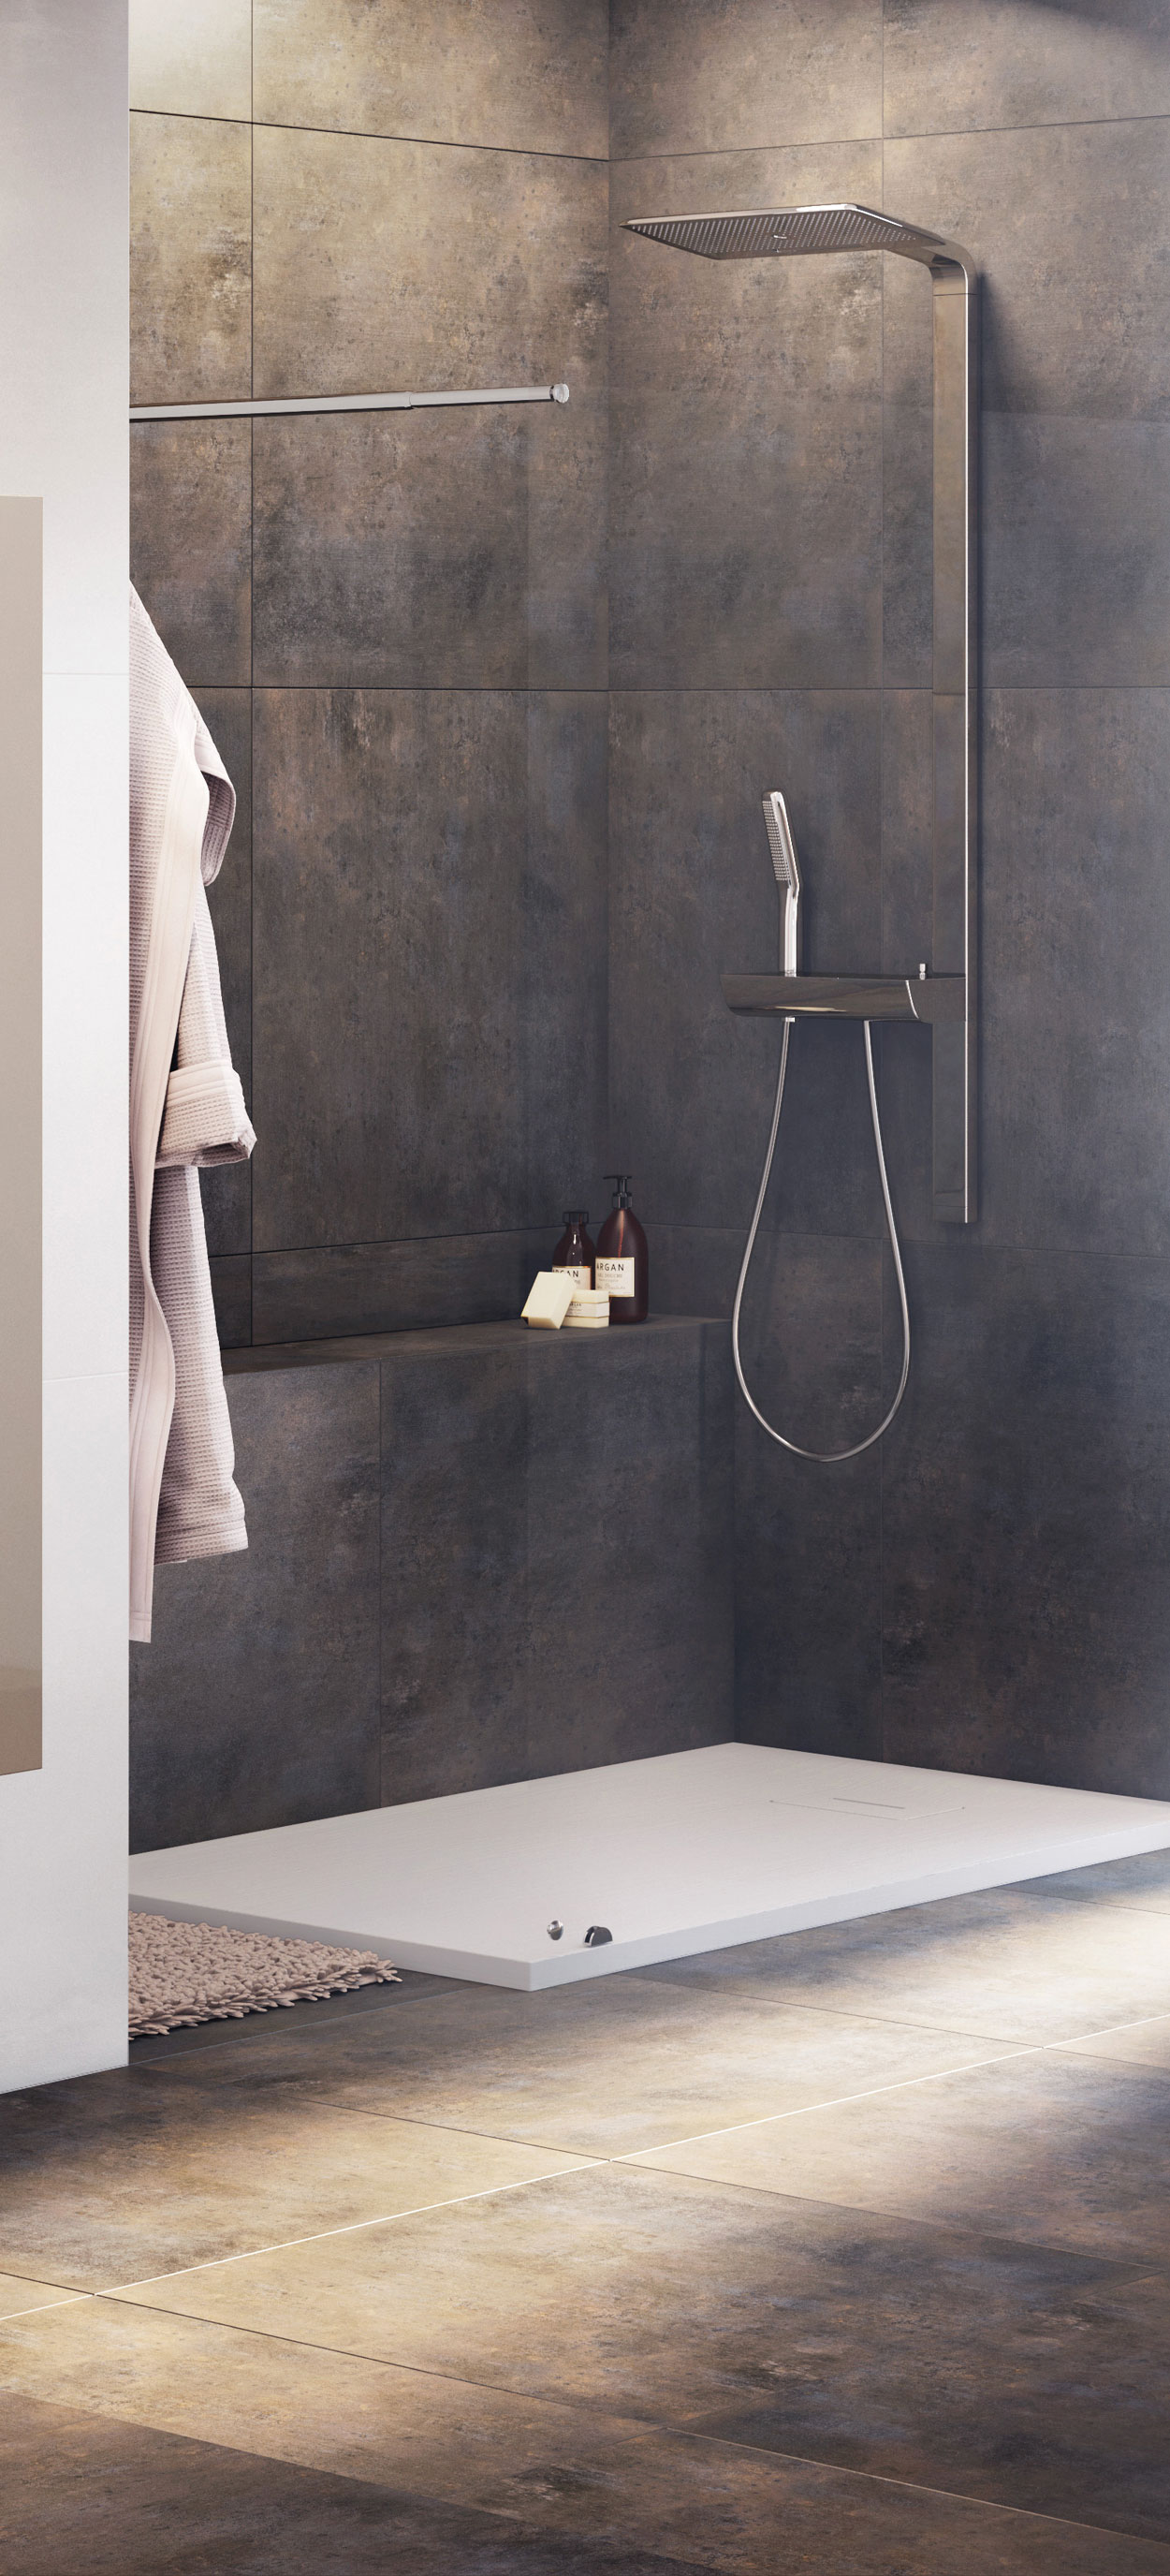 Equipement de douche